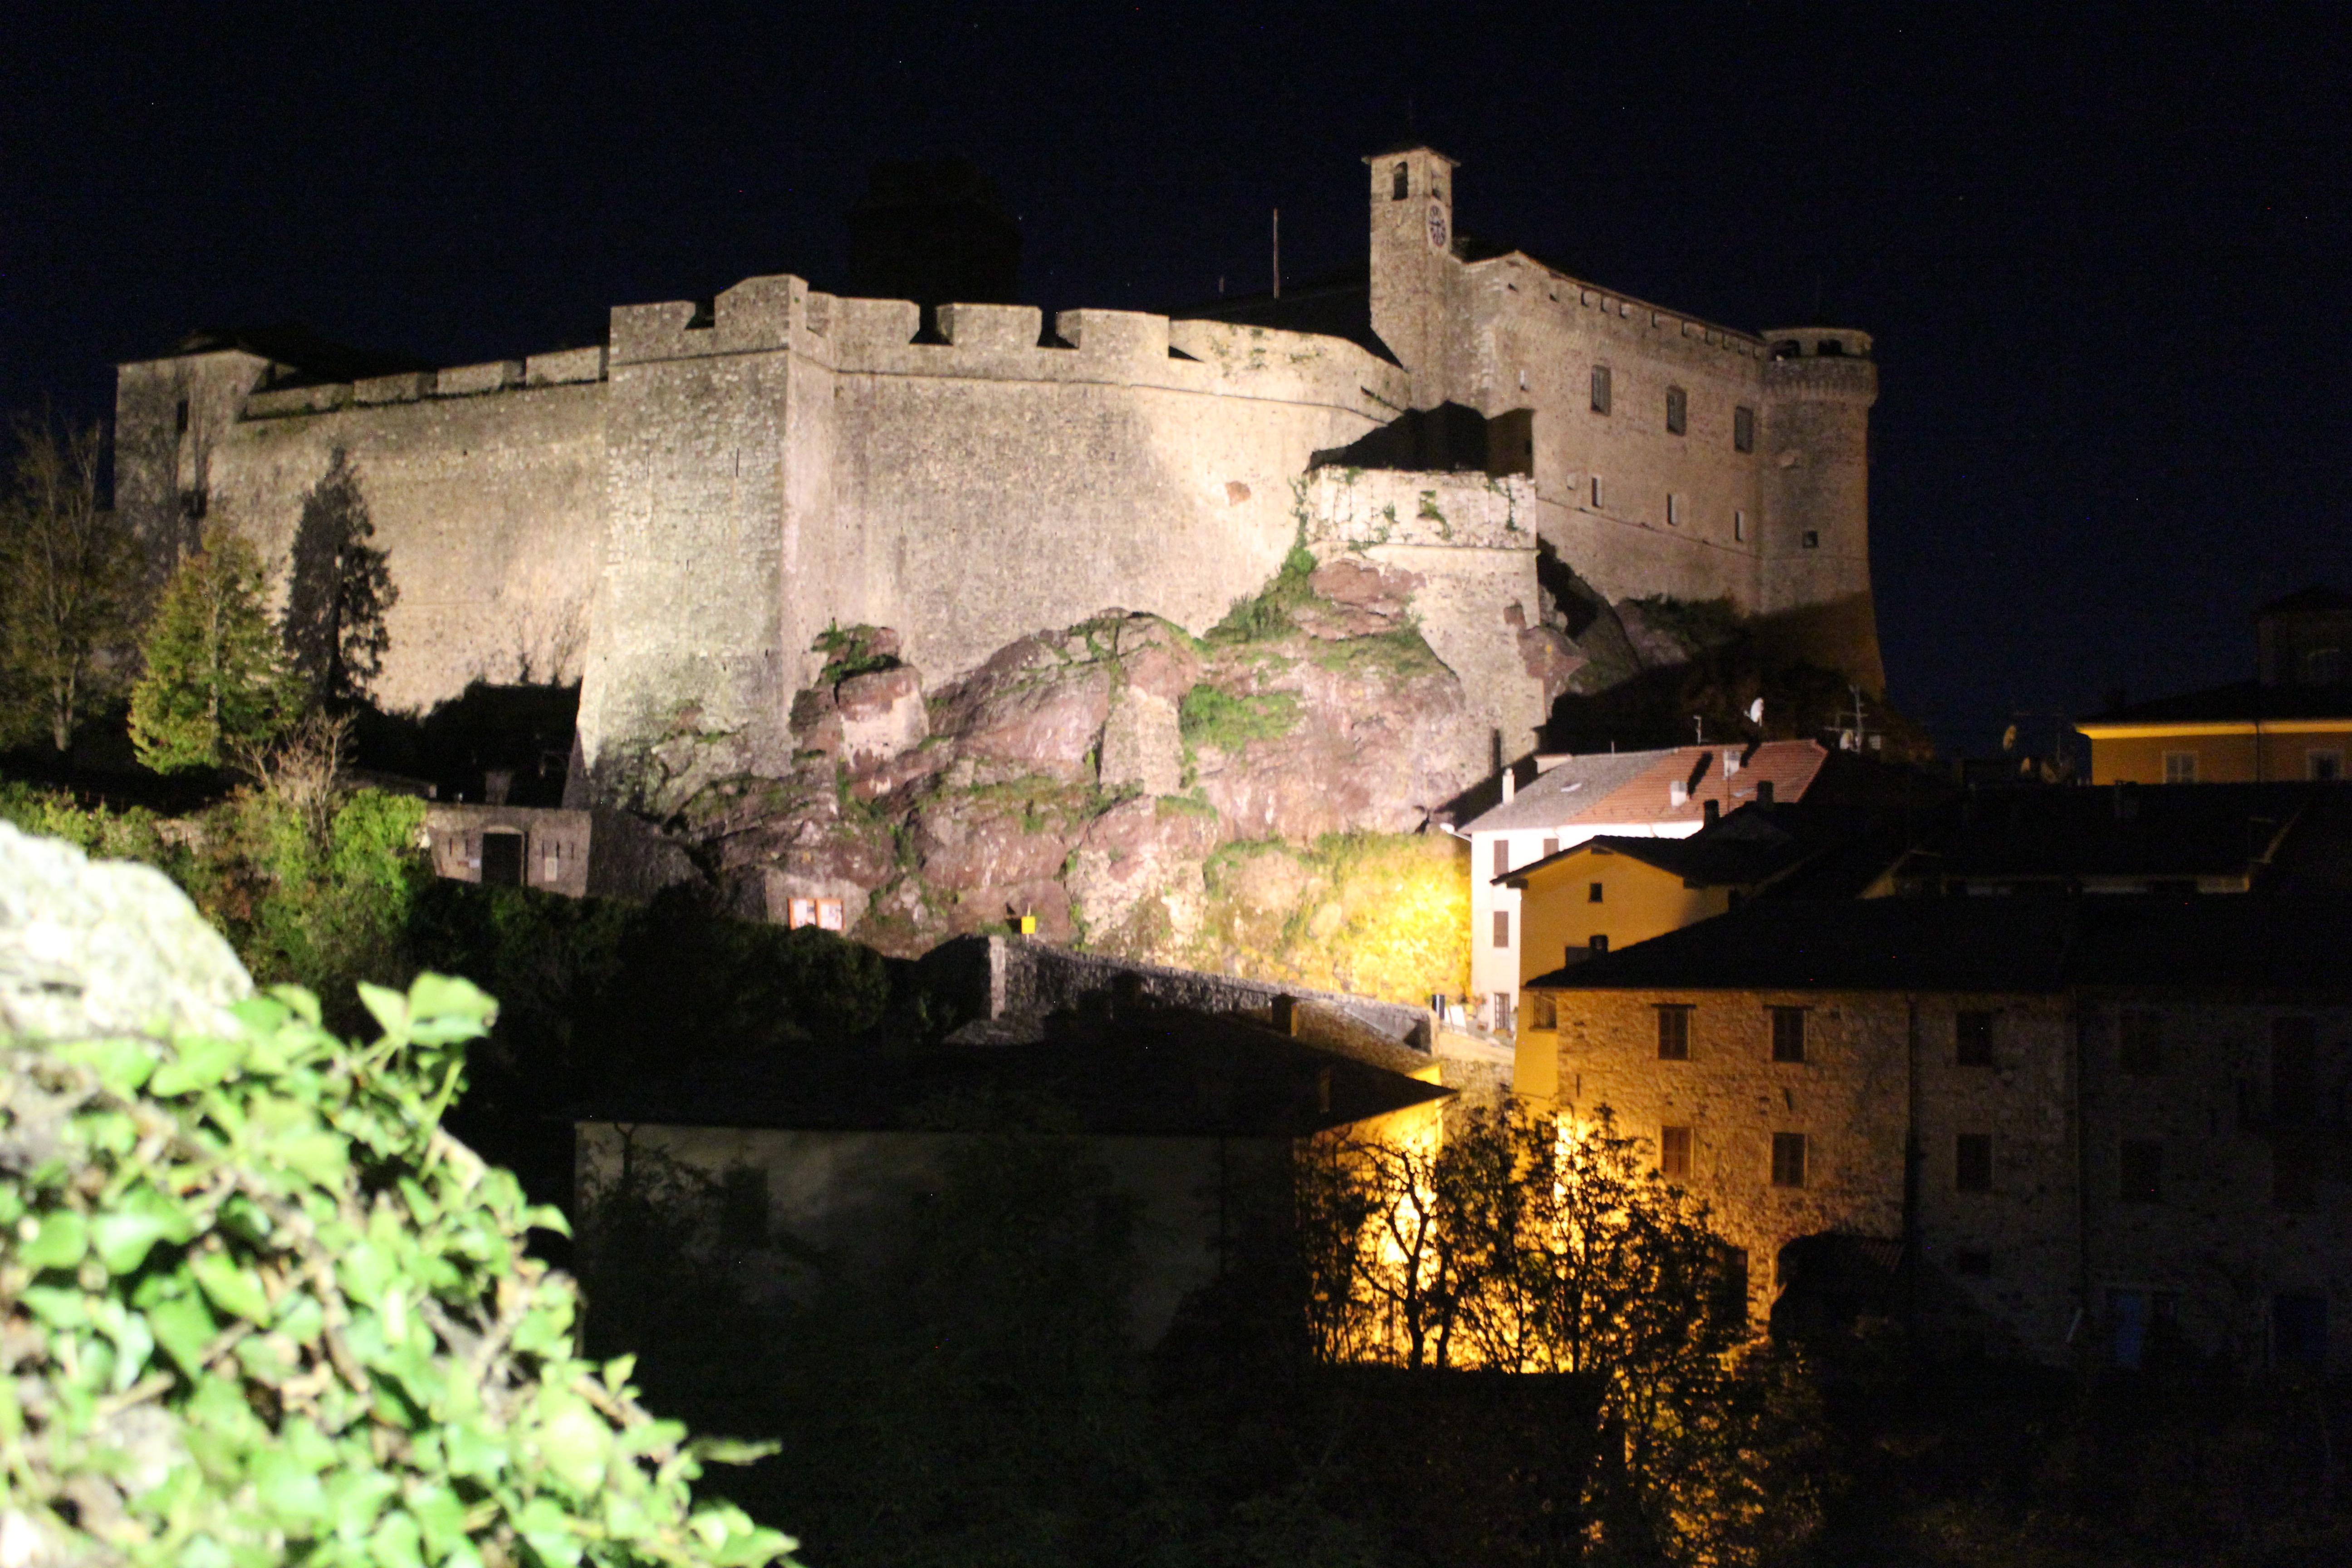 castello di bardi, visita notturna